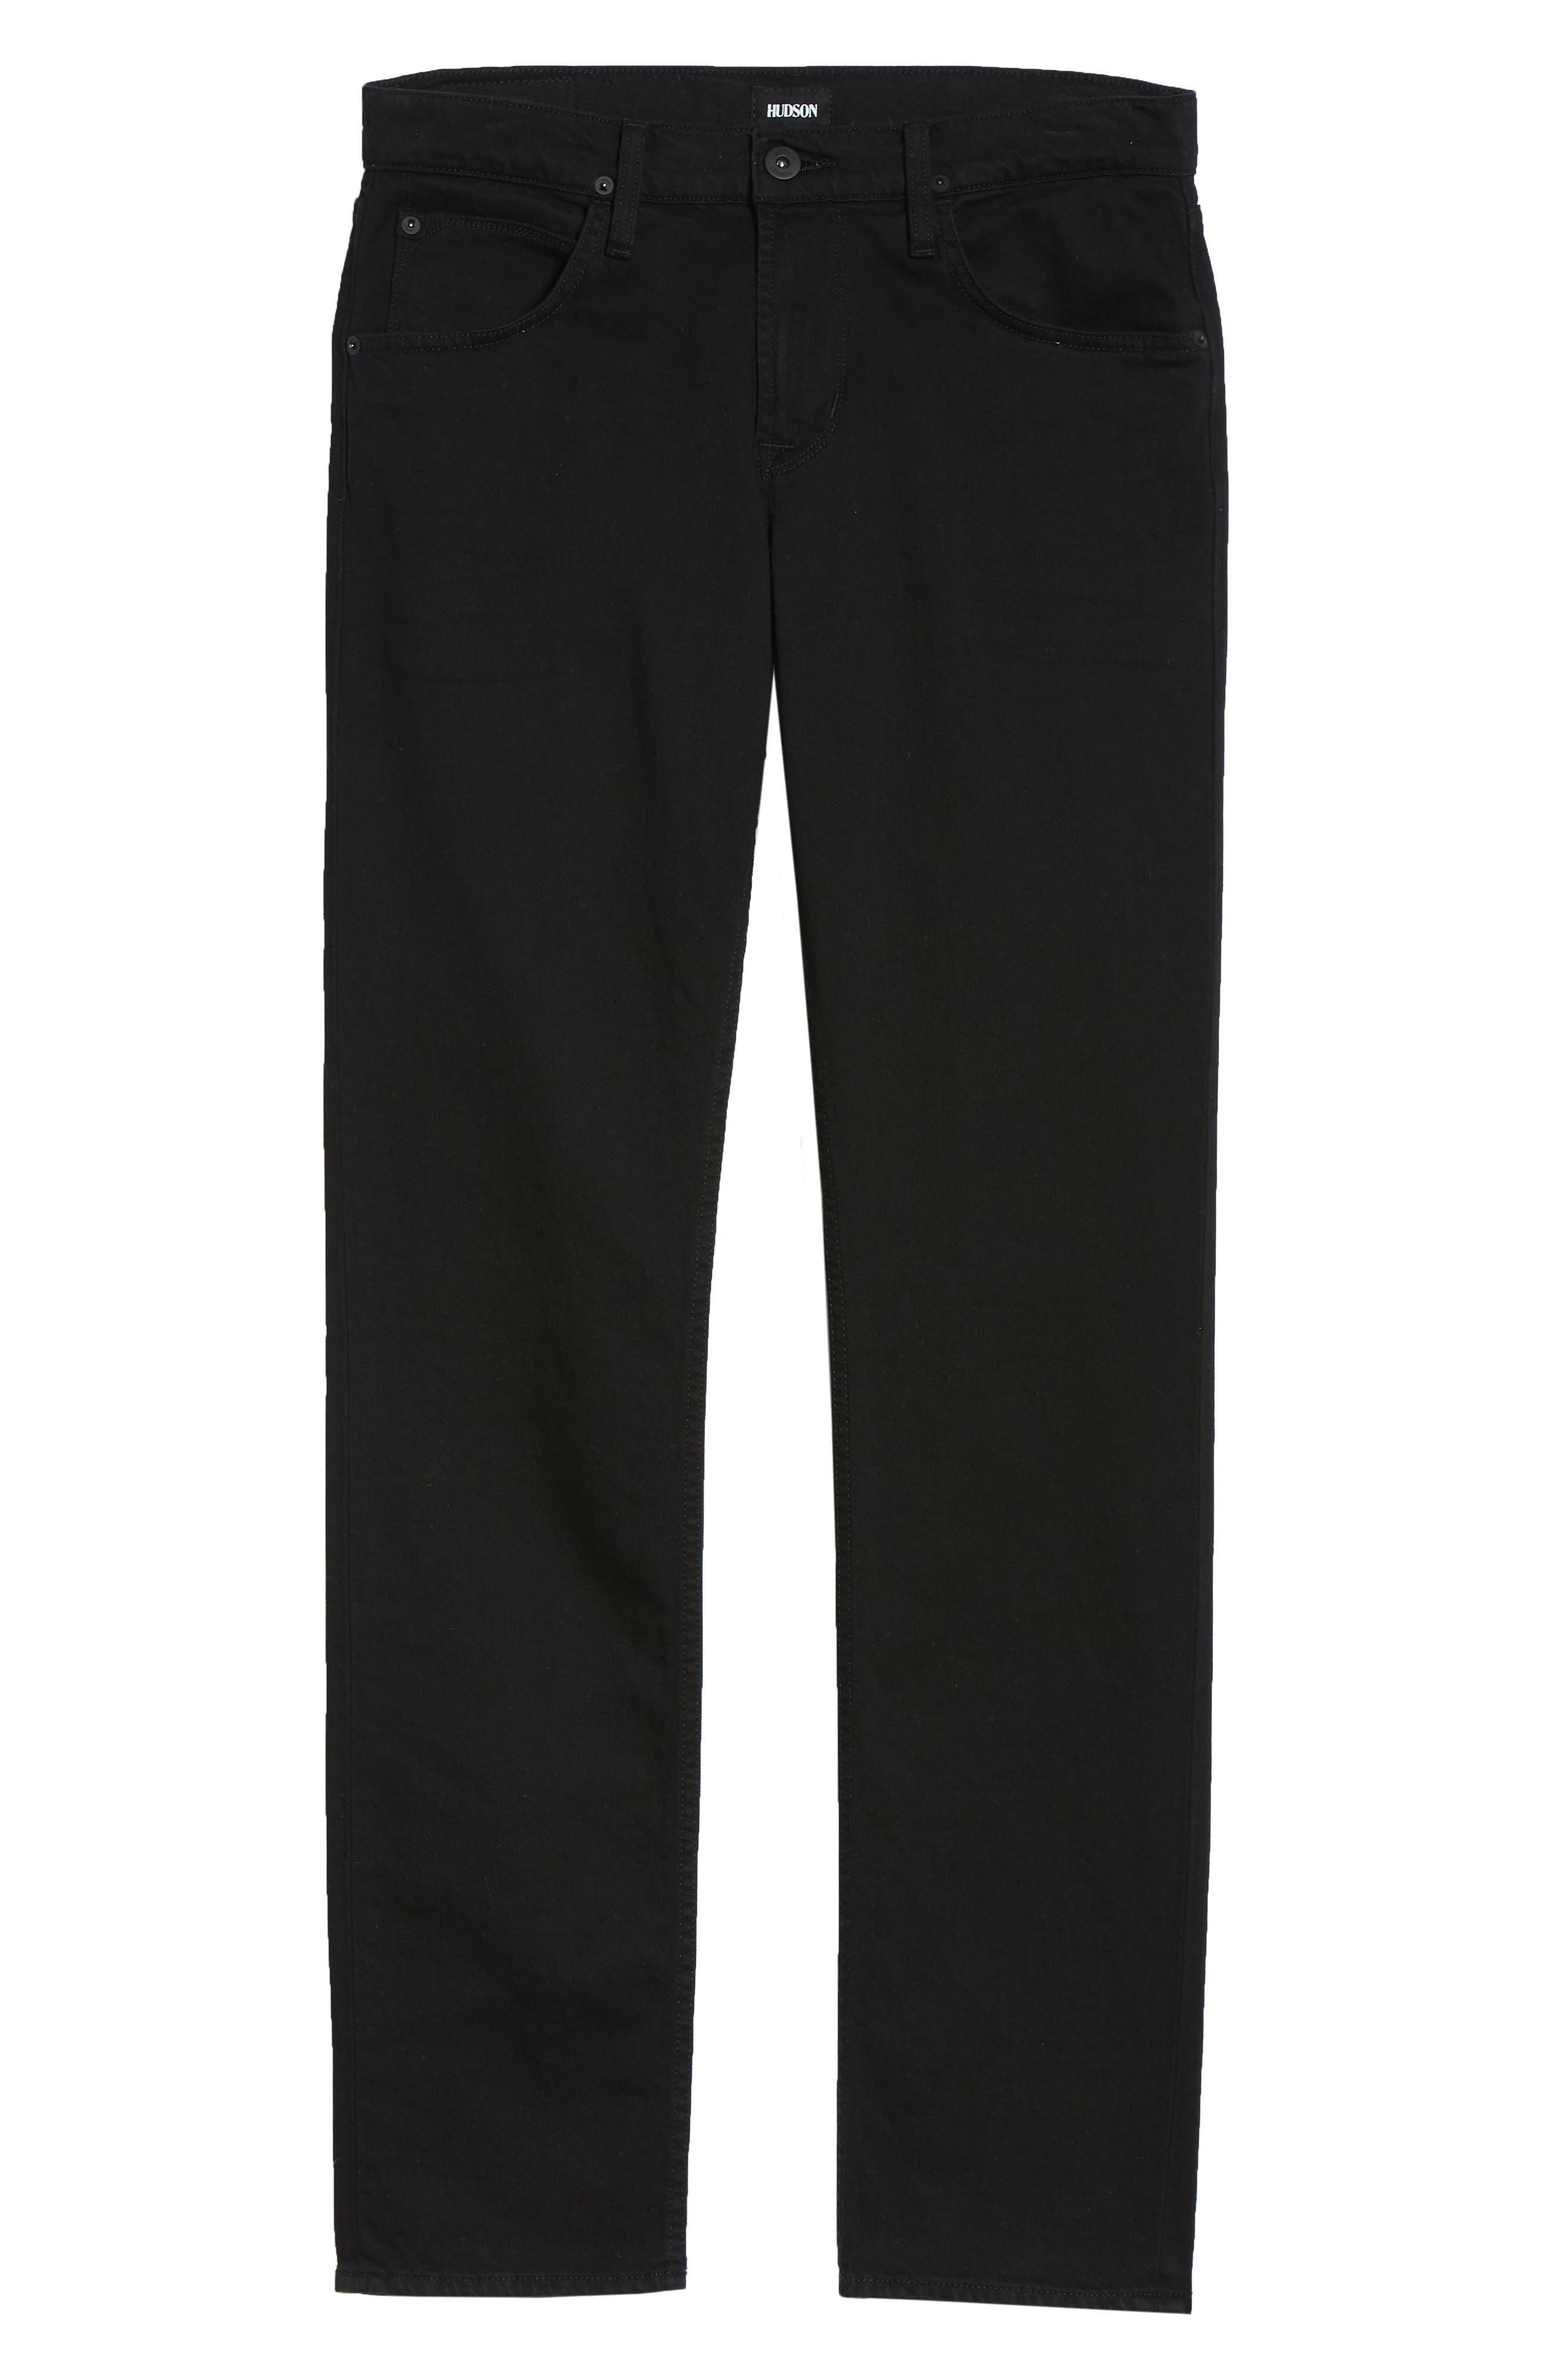 Blake Slim Fit Jeans,                             Alternate thumbnail 6, color,                             Heron